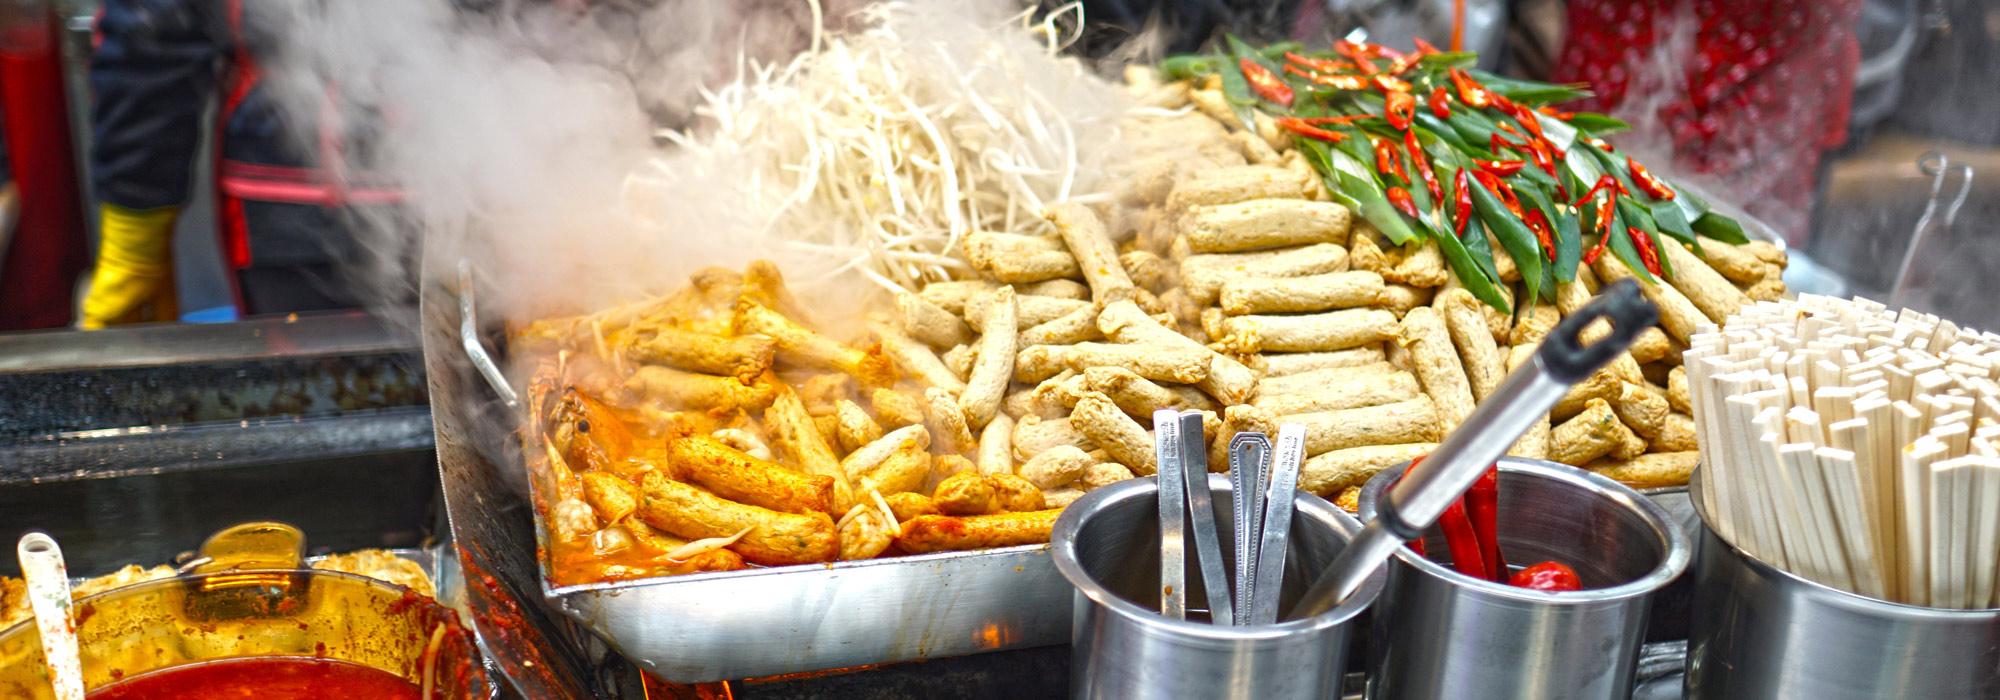 Streetfood in Dubai